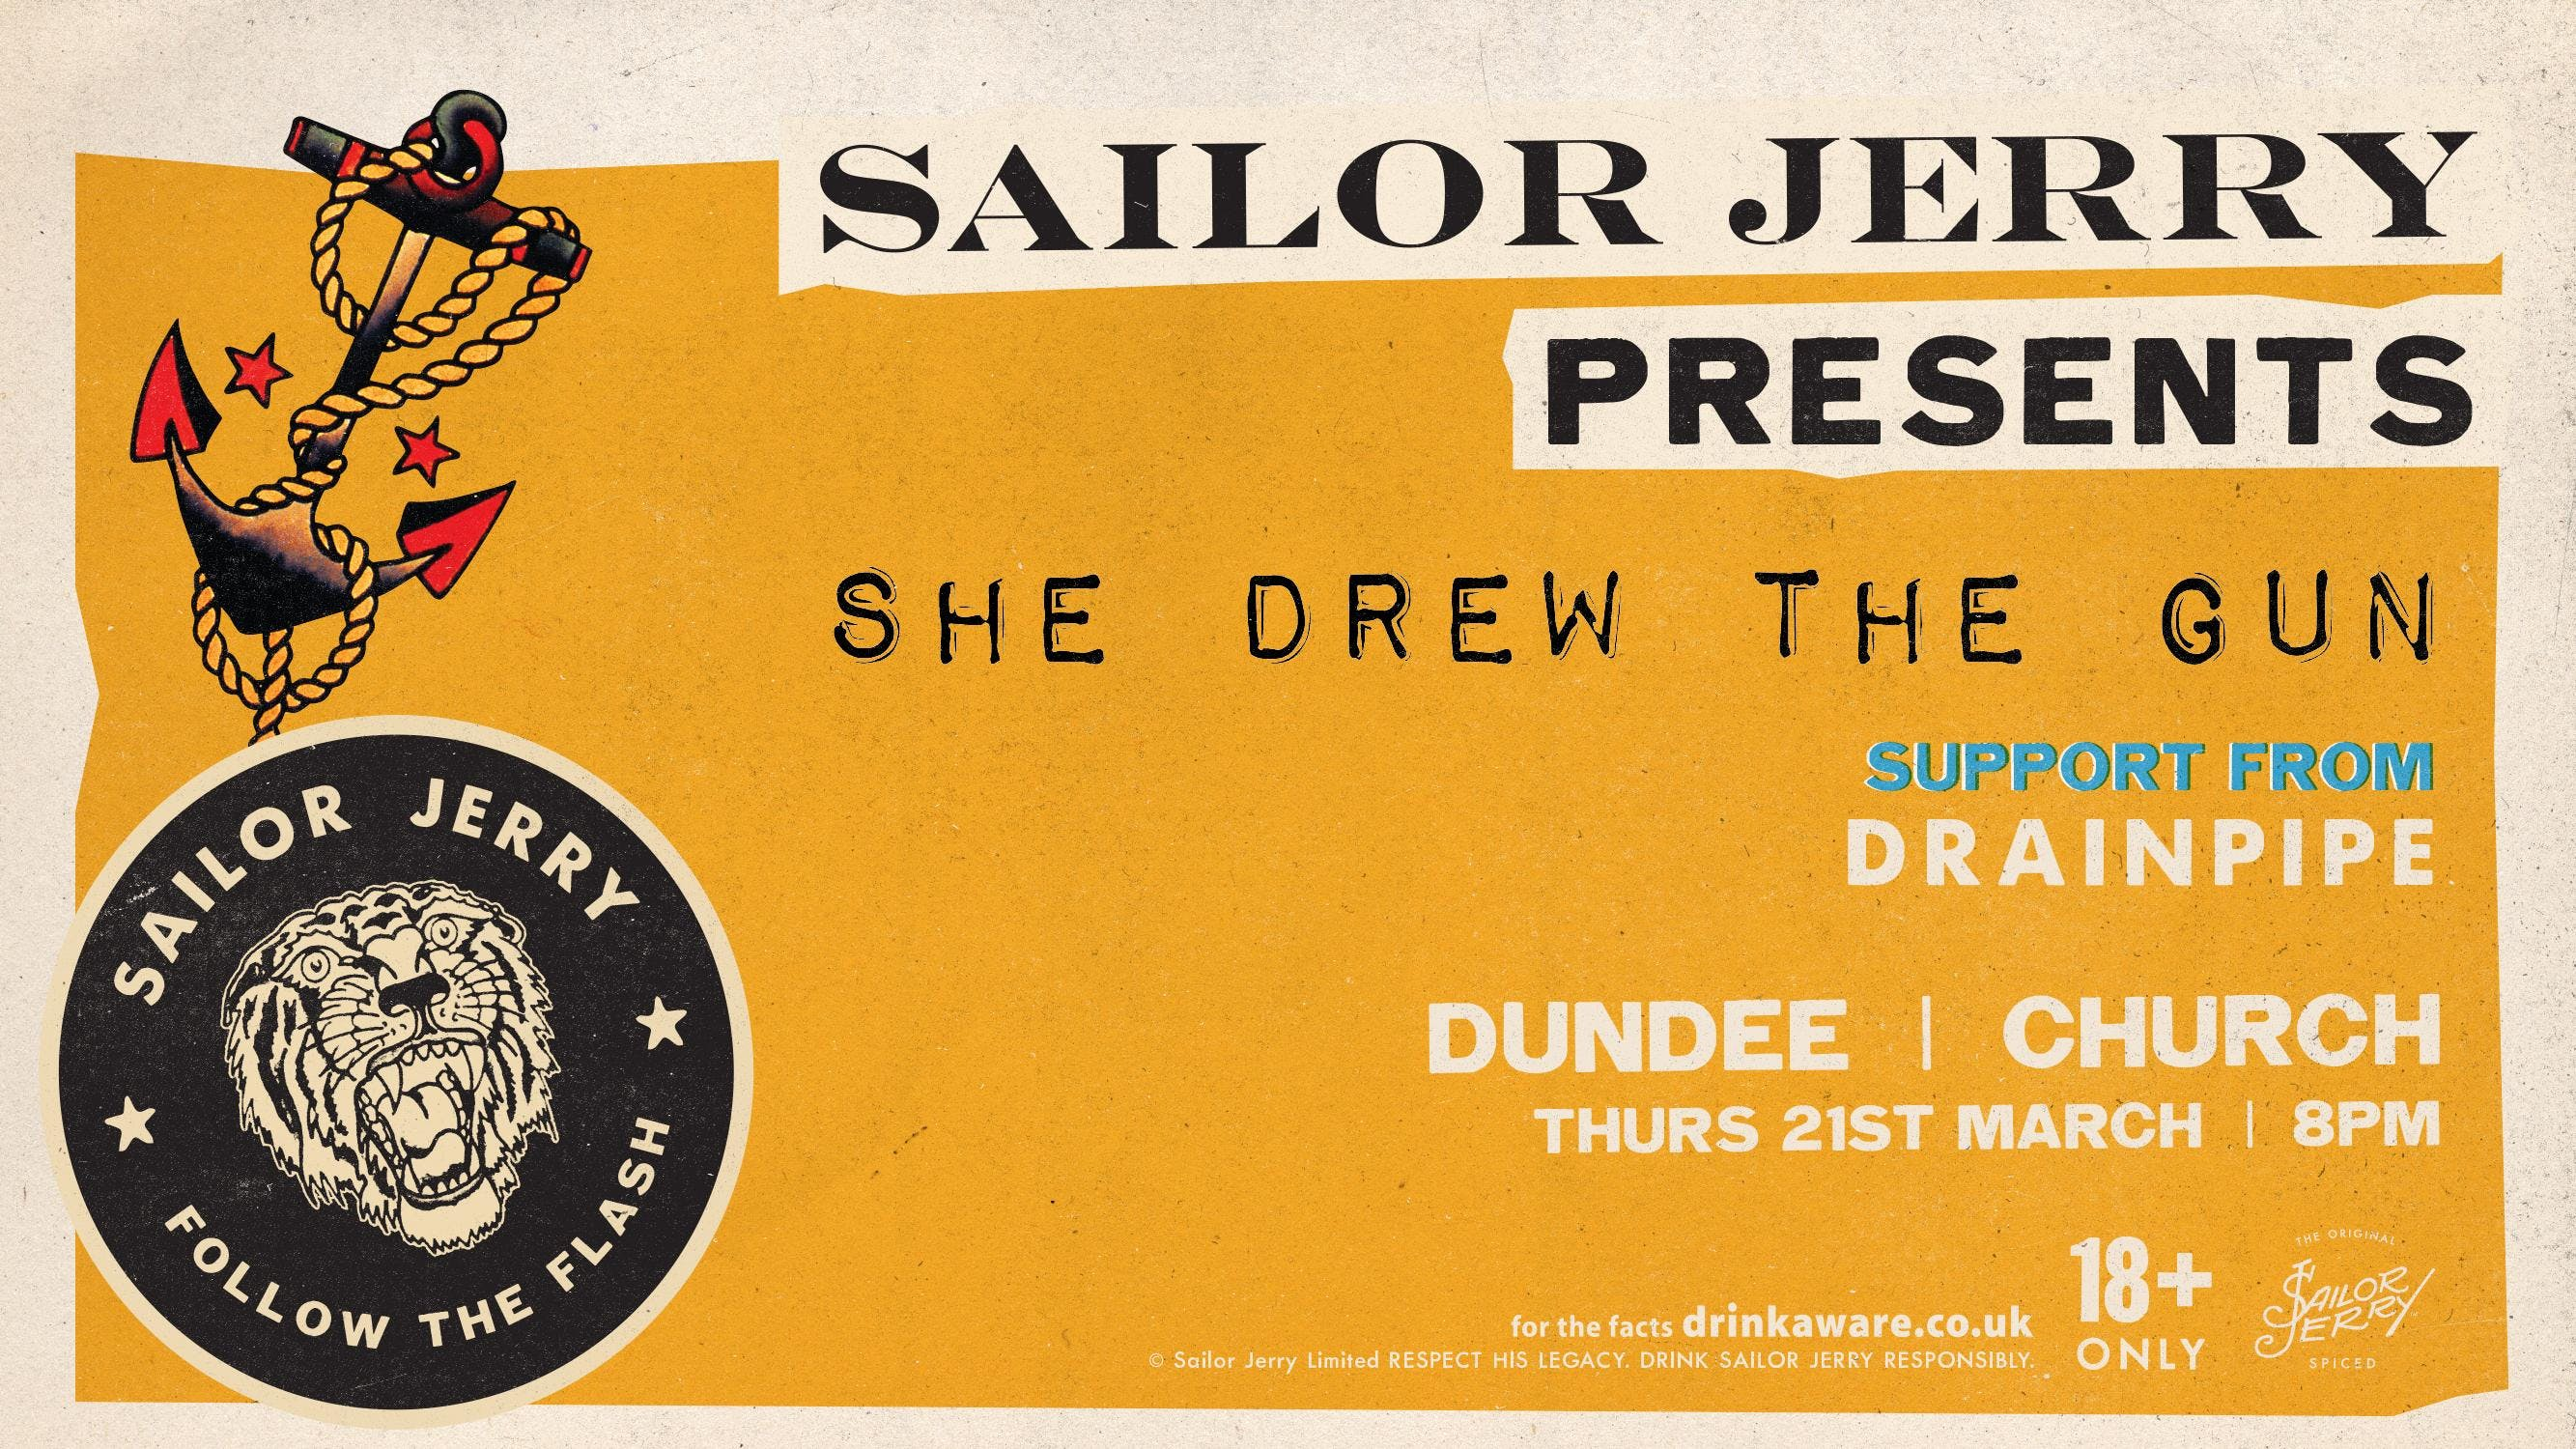 Dundee - Sailor Jerry presents Follow The Fla